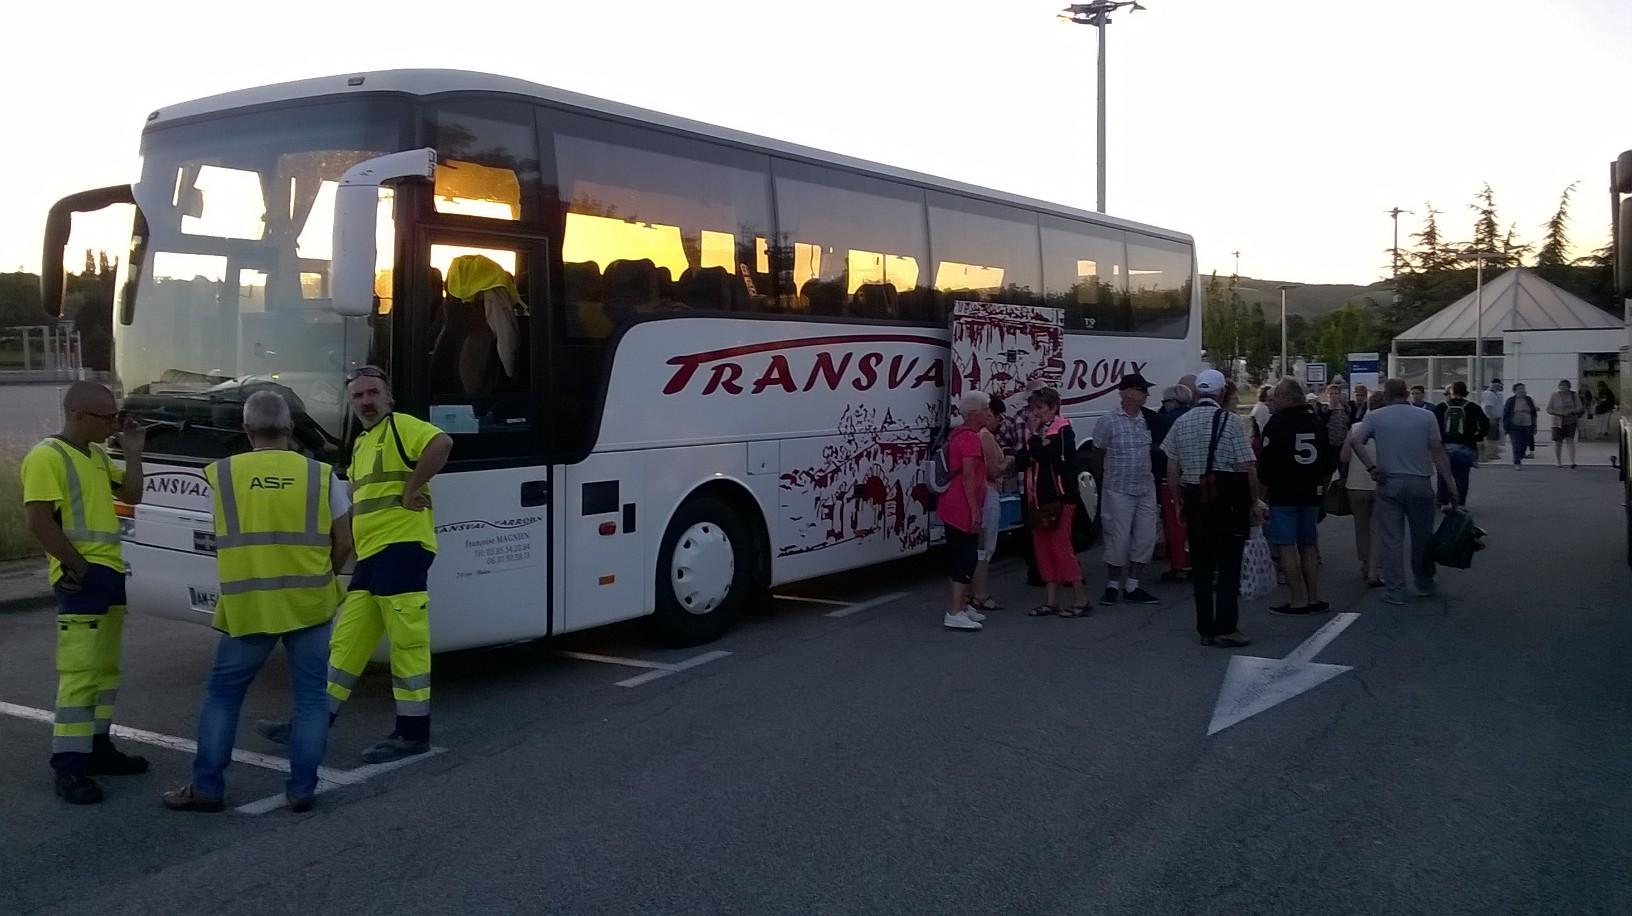 Voyage 2017 bus retour n 19